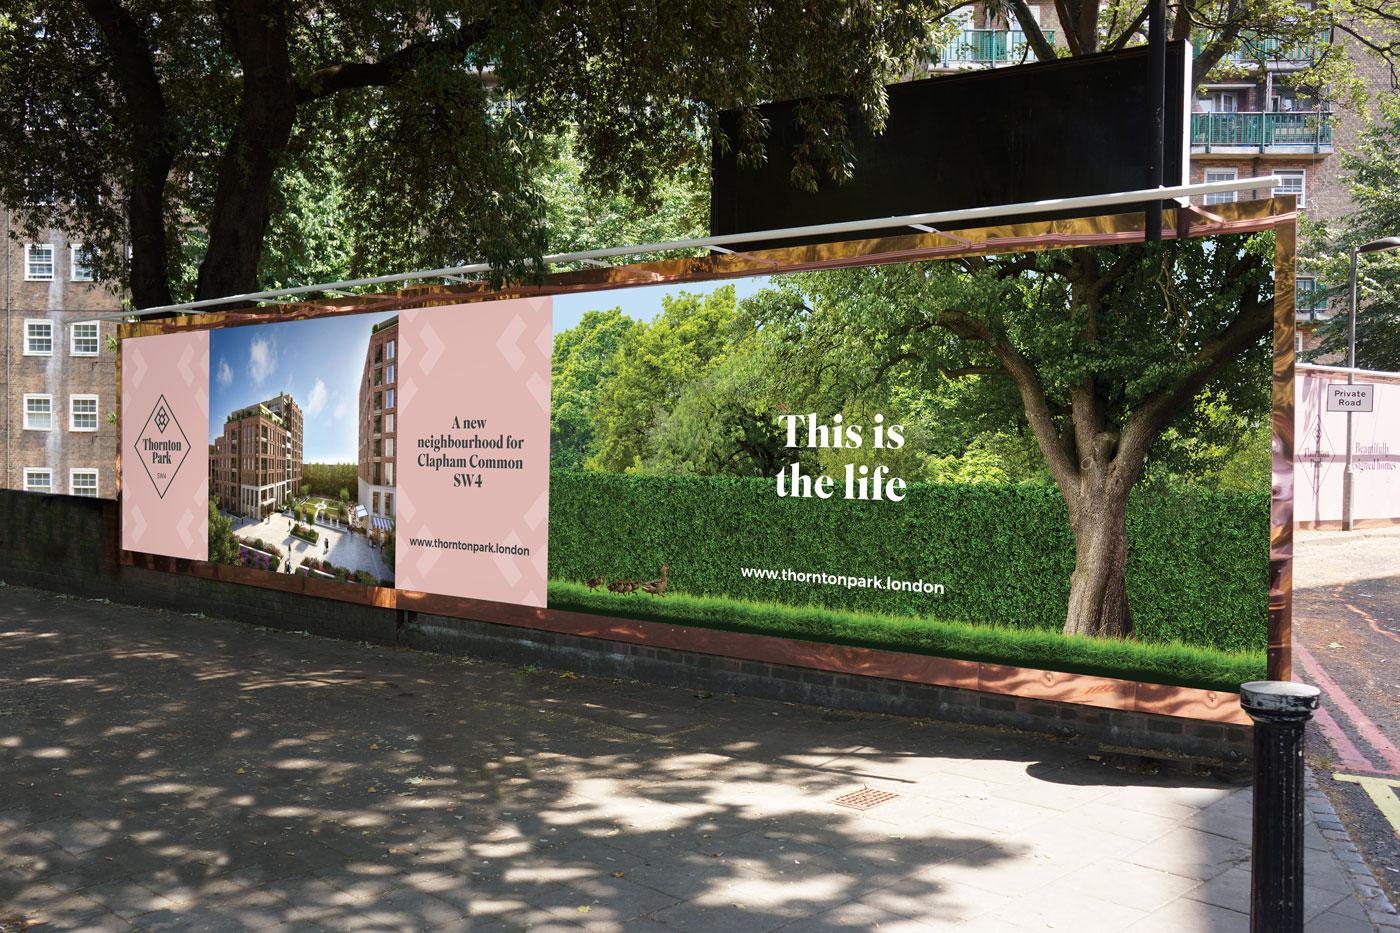 thornton park brand development launch - external hoarding design